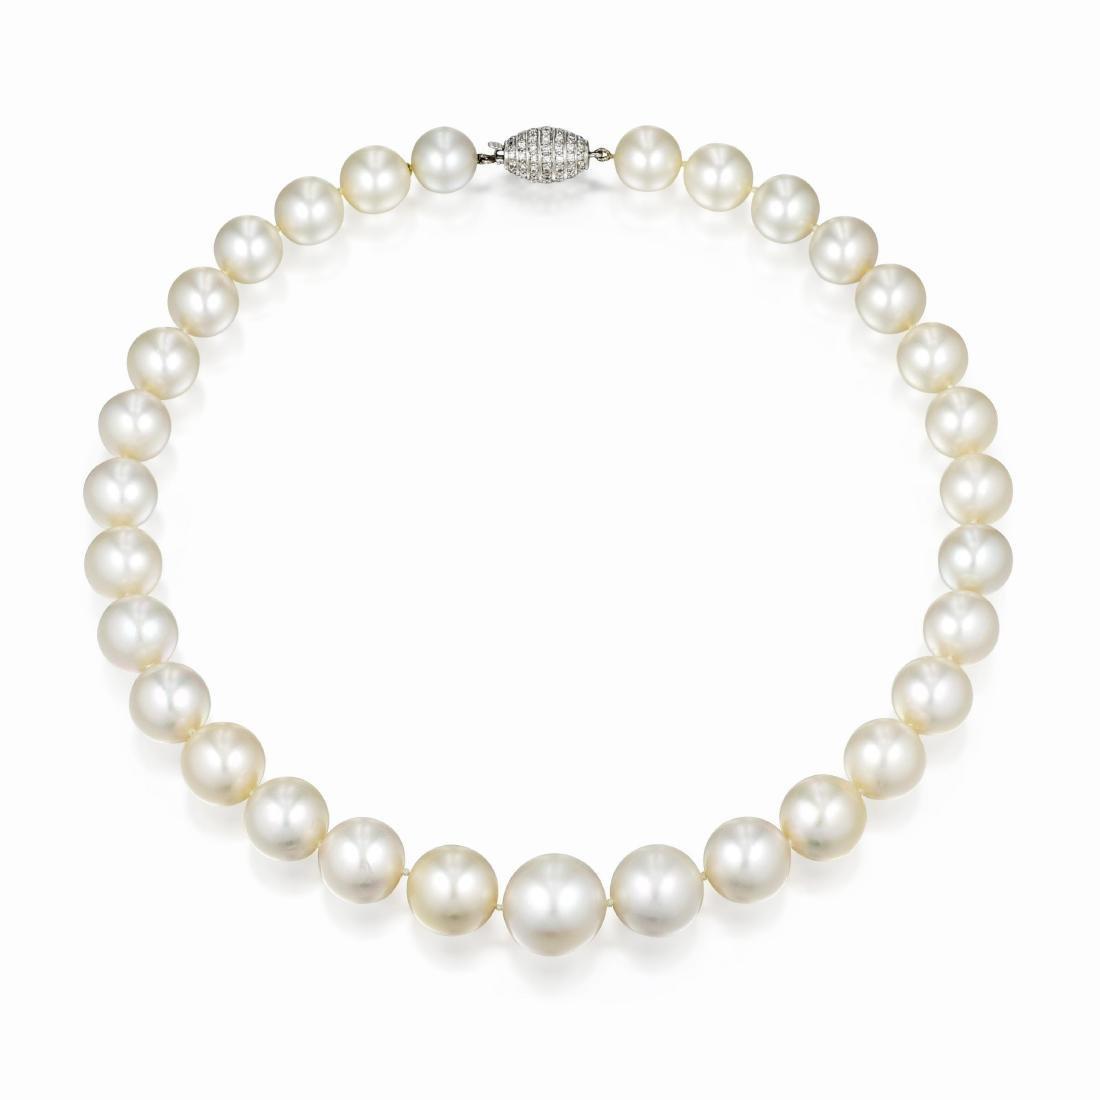 Cartier South Sea Pearl Necklace